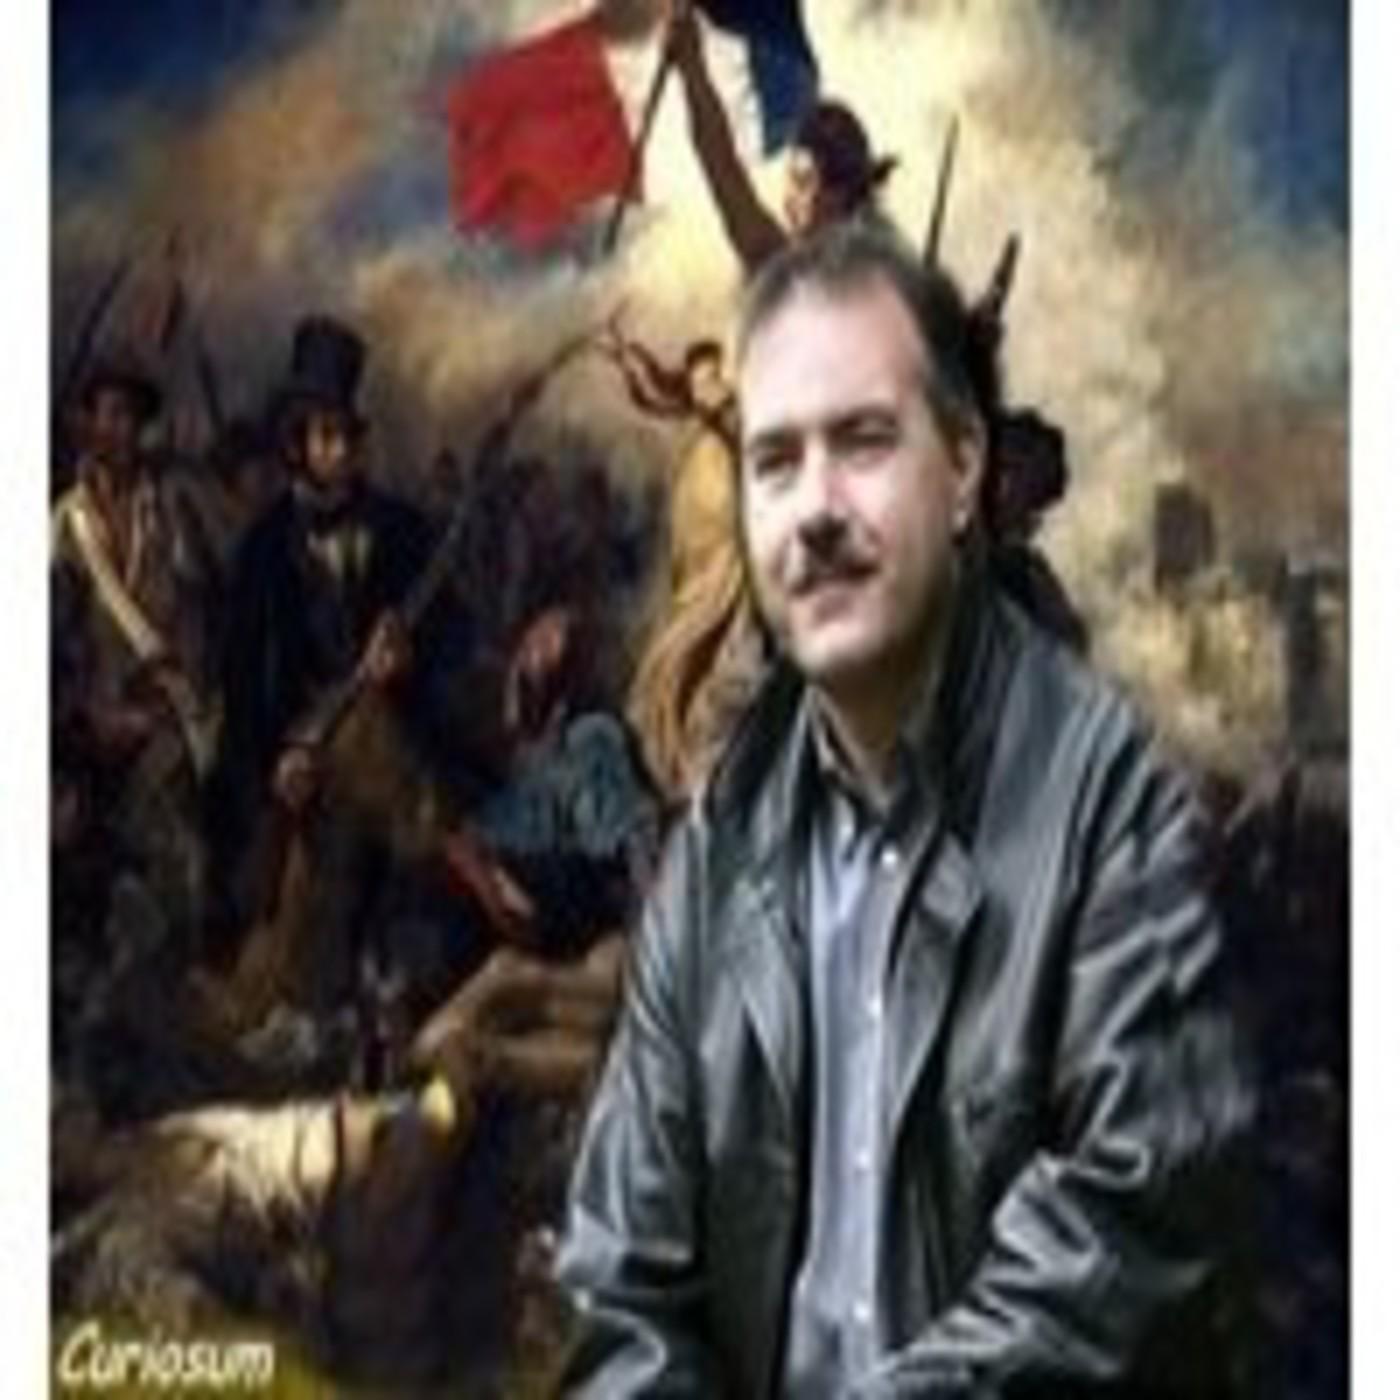 Pasajes de la historia. Revolución Francesa, Robespierre contra J. Fouché.